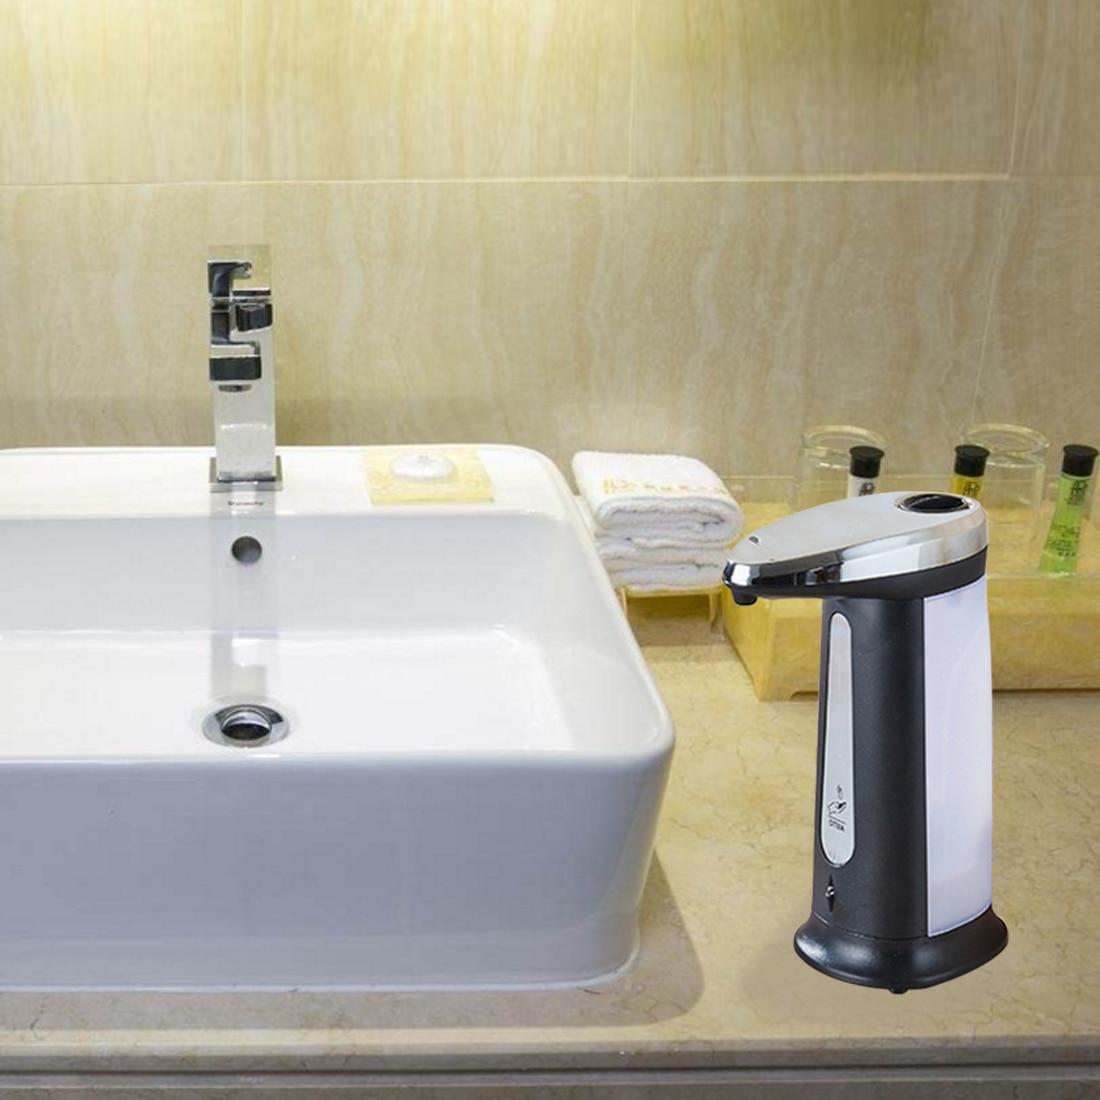 1pcs 400Ml ABS Electroplated Automatic Liquid Soap Dispenser Smart Sensor Touchless Sanitizer for Kitchen Bathroom